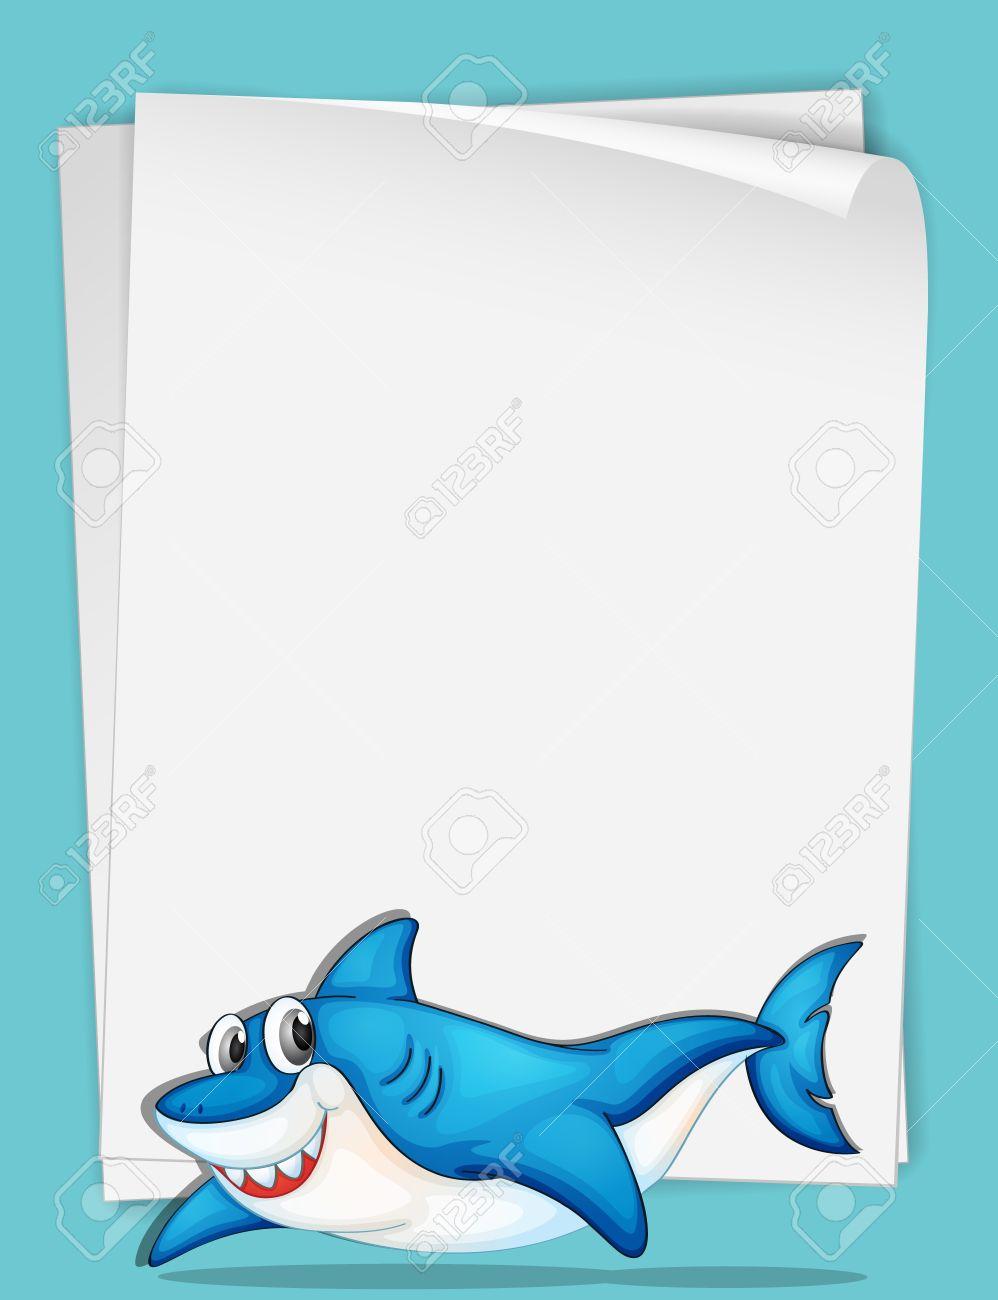 illustration of shark swimming paper royalty cliparts  illustration of shark swimming paper stock vector 13667489